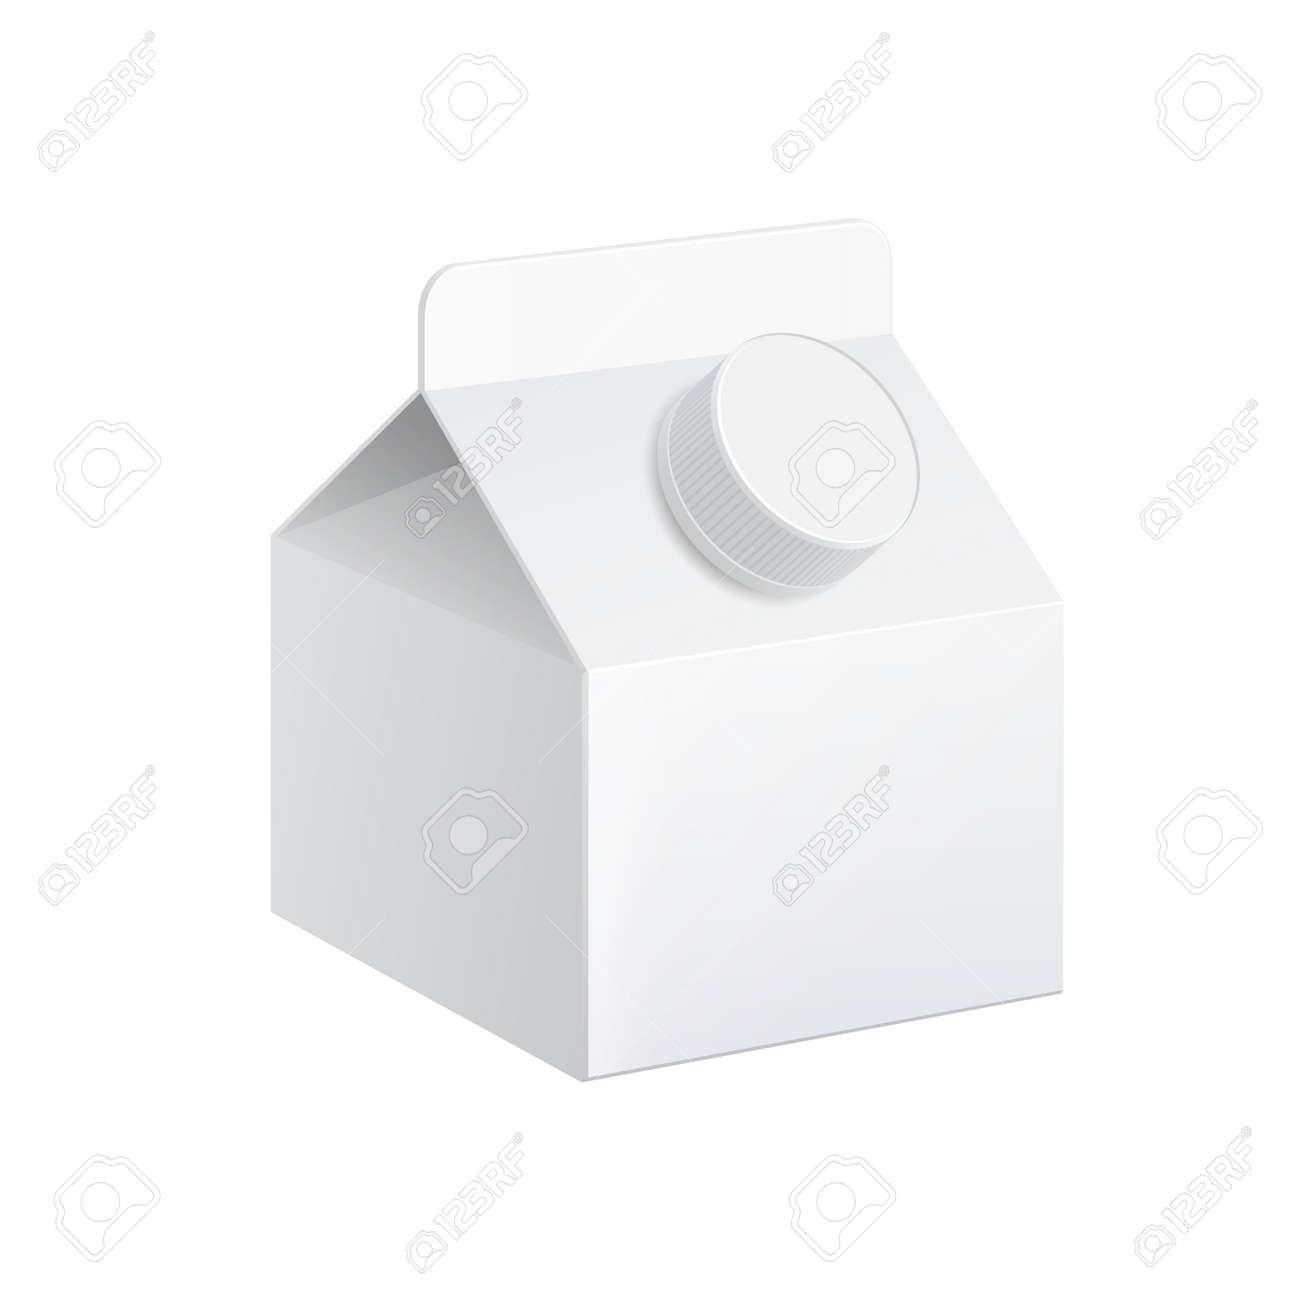 Realistic carton of milk. - 156326670